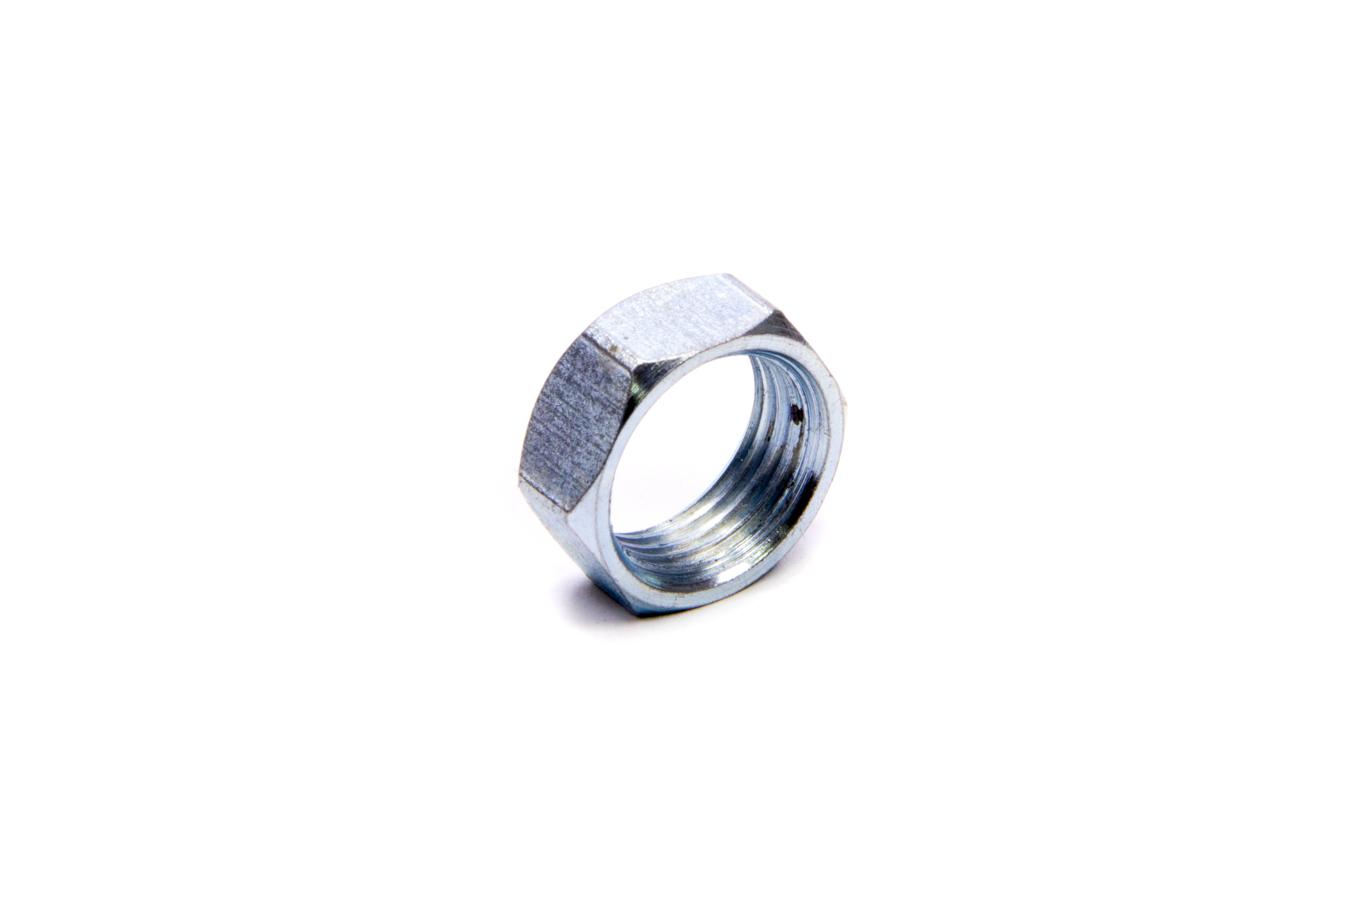 Diversified Machine JAM10L Jam Nut, 5/8-18 in Left Hand Thread, Steel, Zinc Oxide, Each